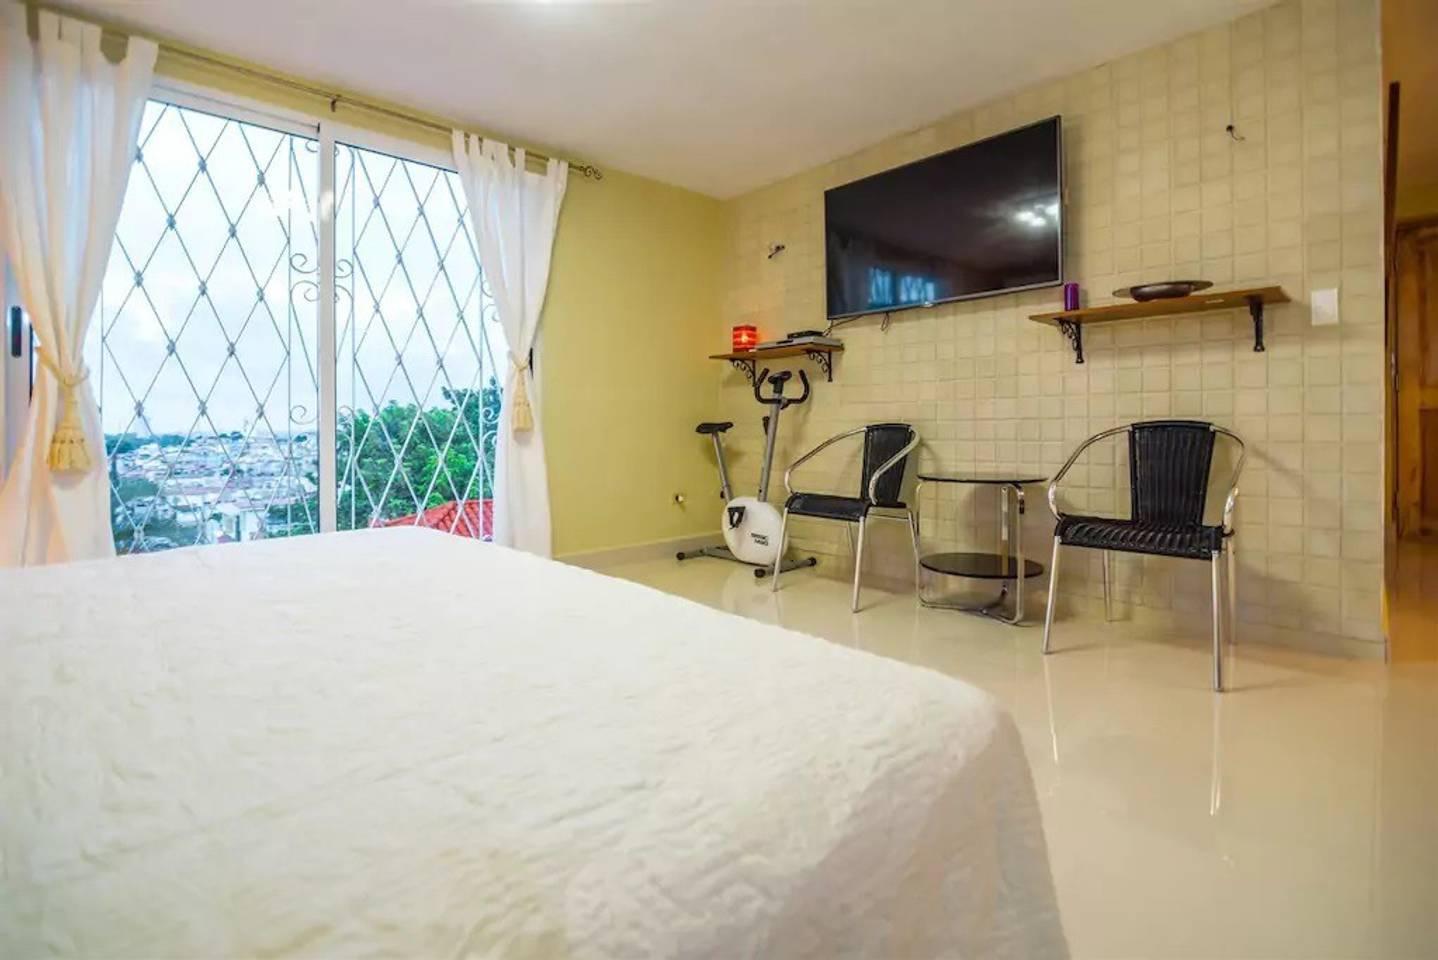 Apartment Villa Don Teto 8 Rooms  Luxury   Great Havana View photo 23332333